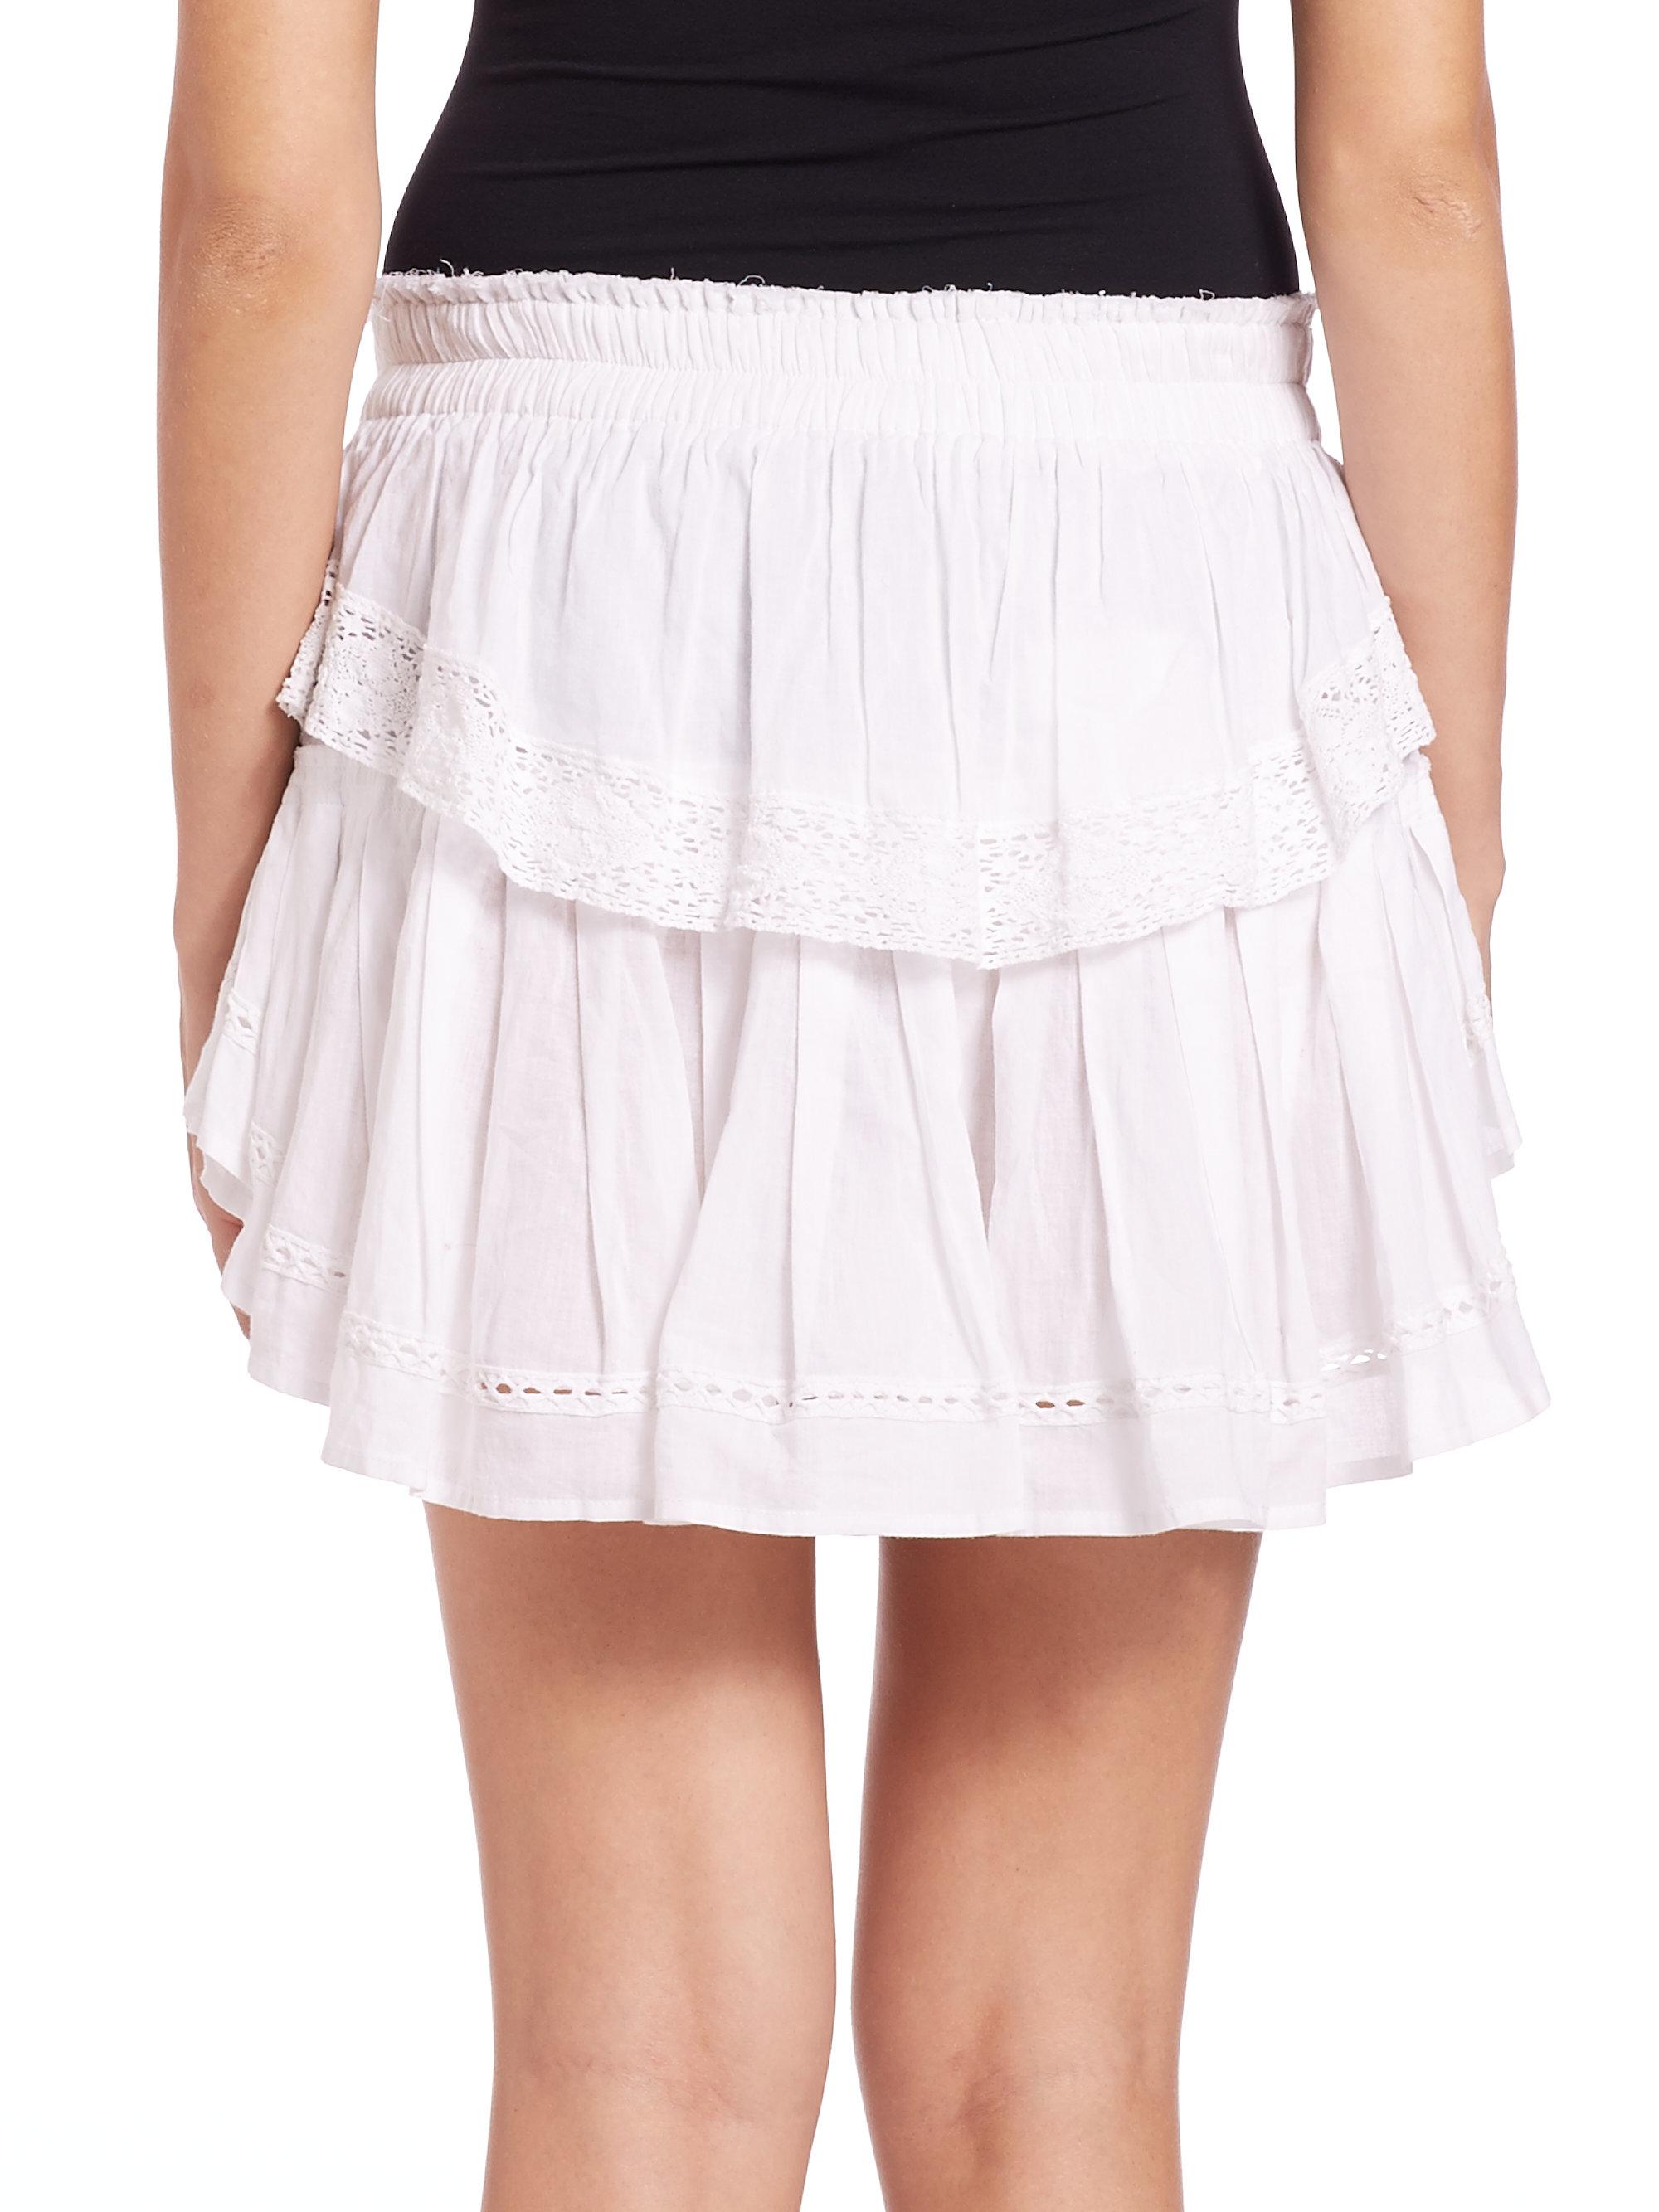 b67a3daea2b32 Cotton ruffles shorts Fitness t Shorts Skort and Polyvore